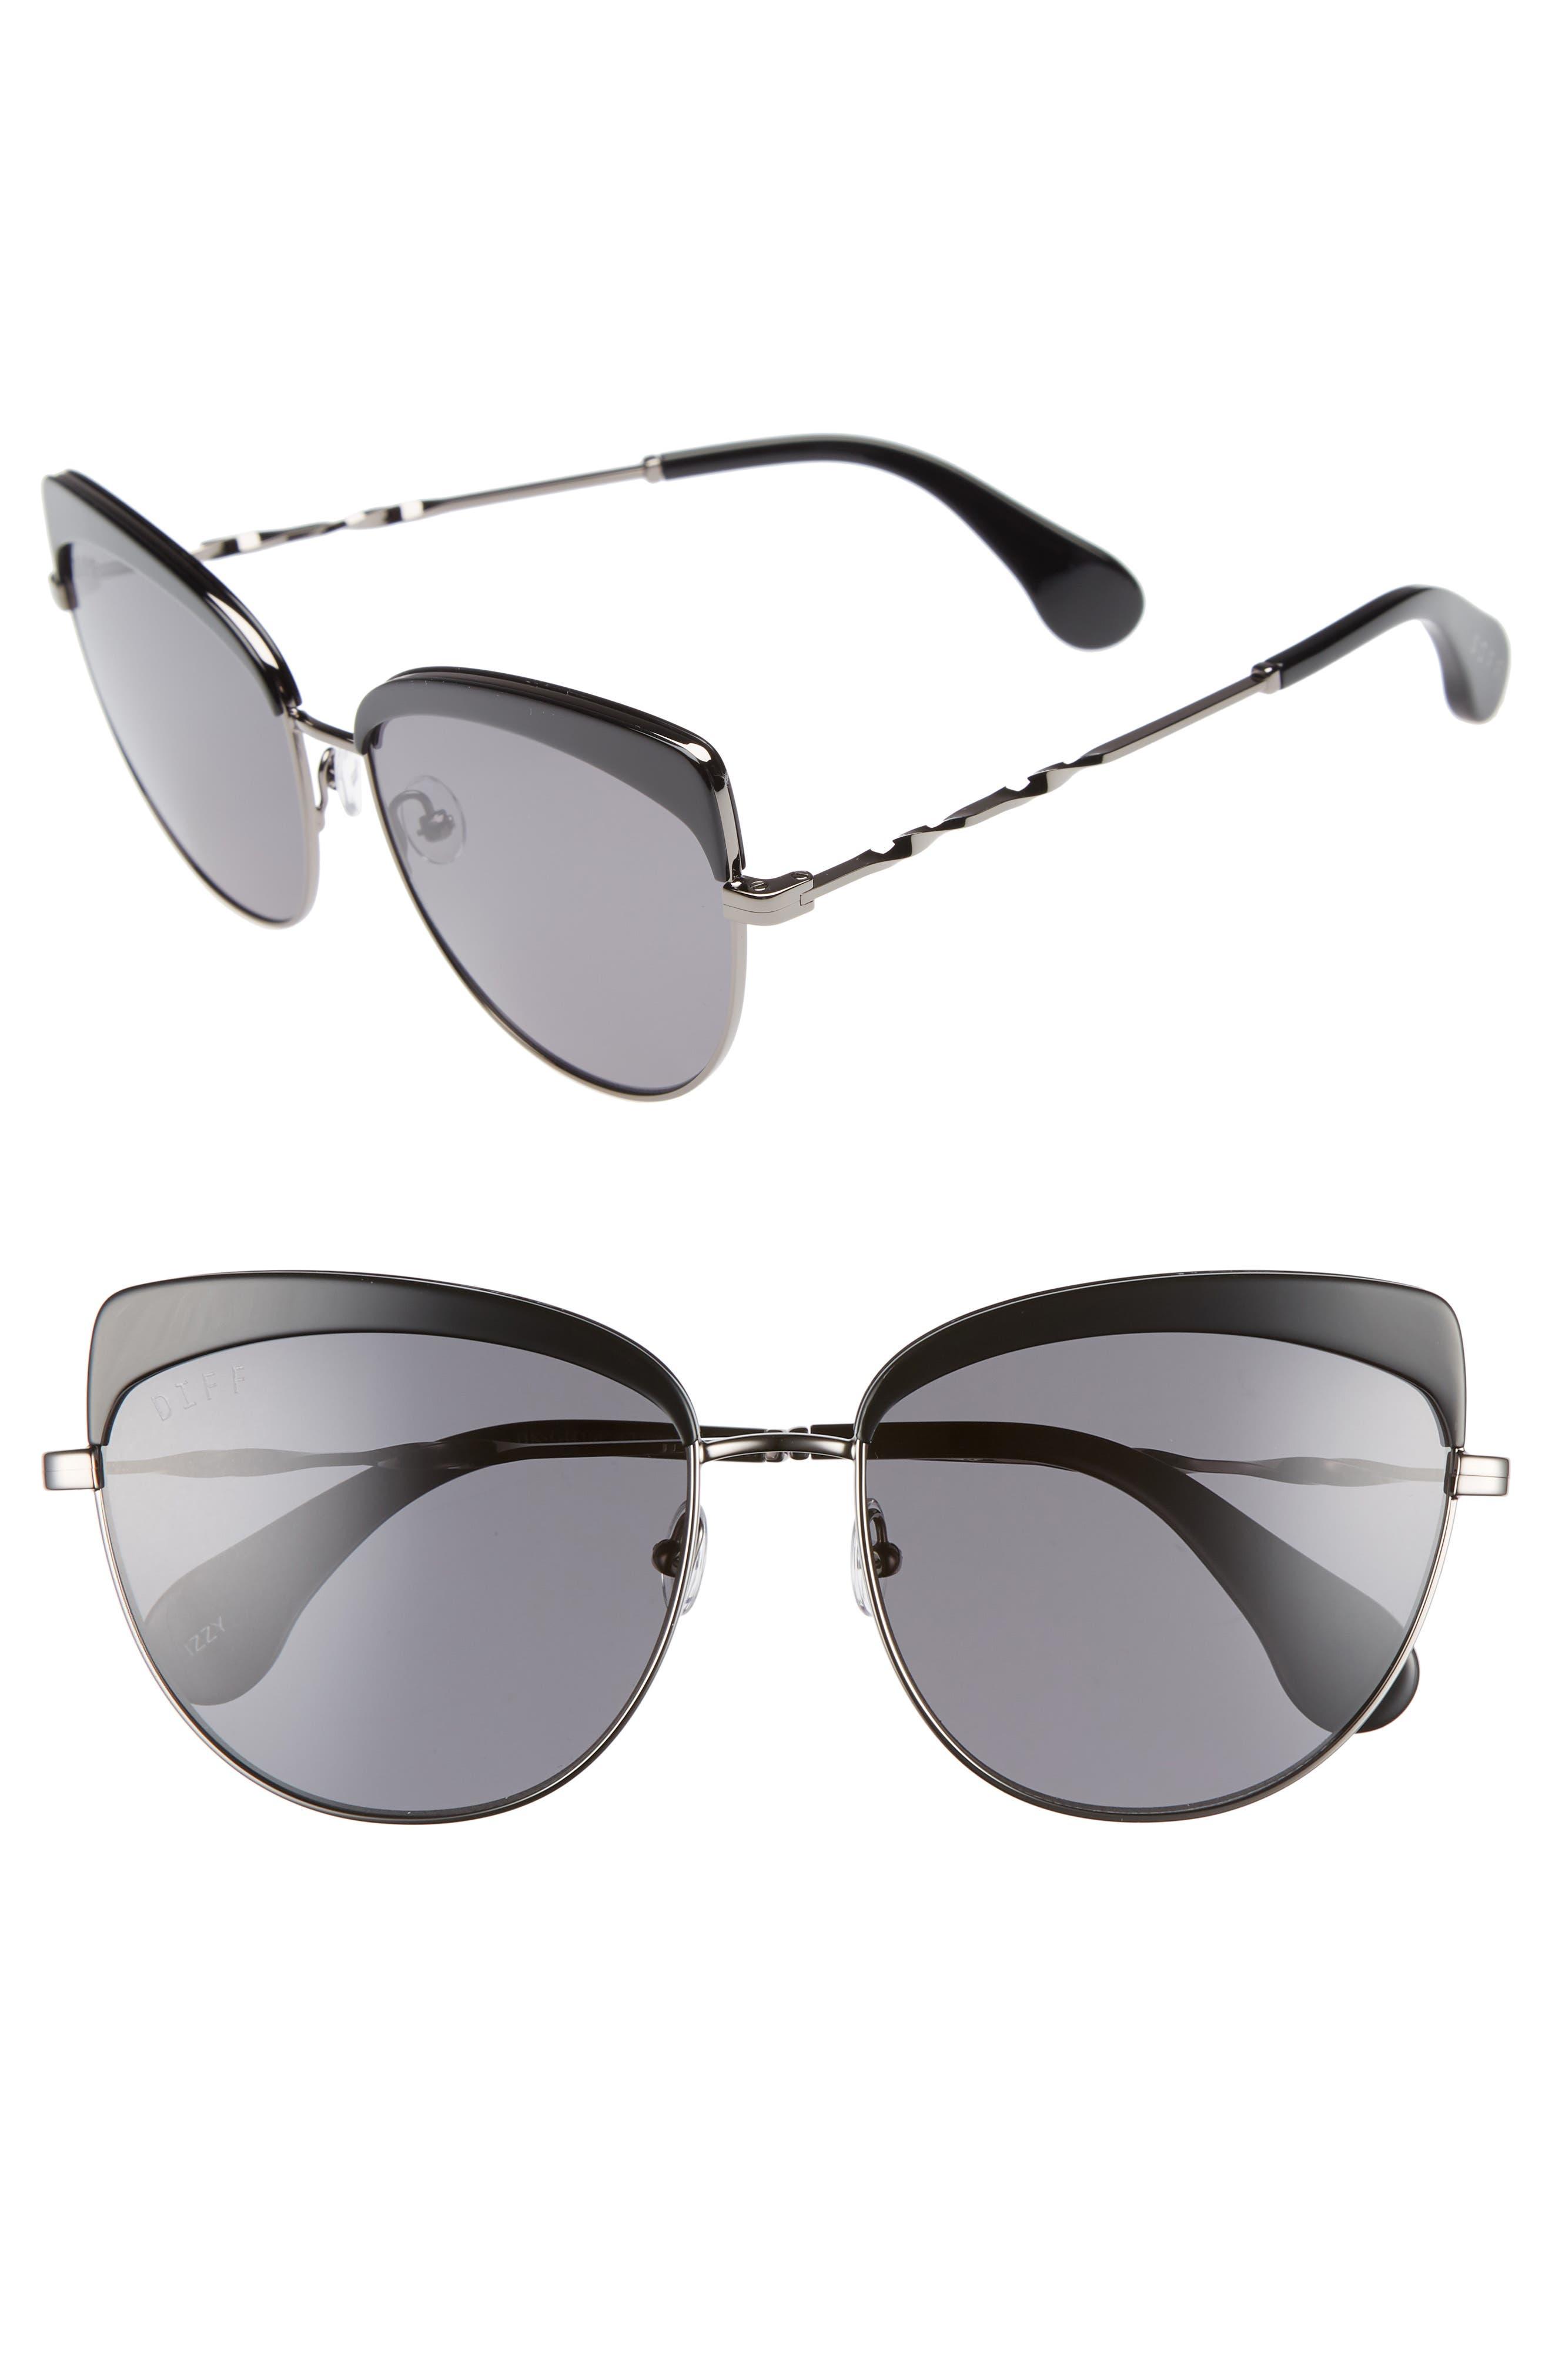 Izzy 59mm Polarized Cat Eye Sunglasses,                         Main,                         color, Black/ Grey